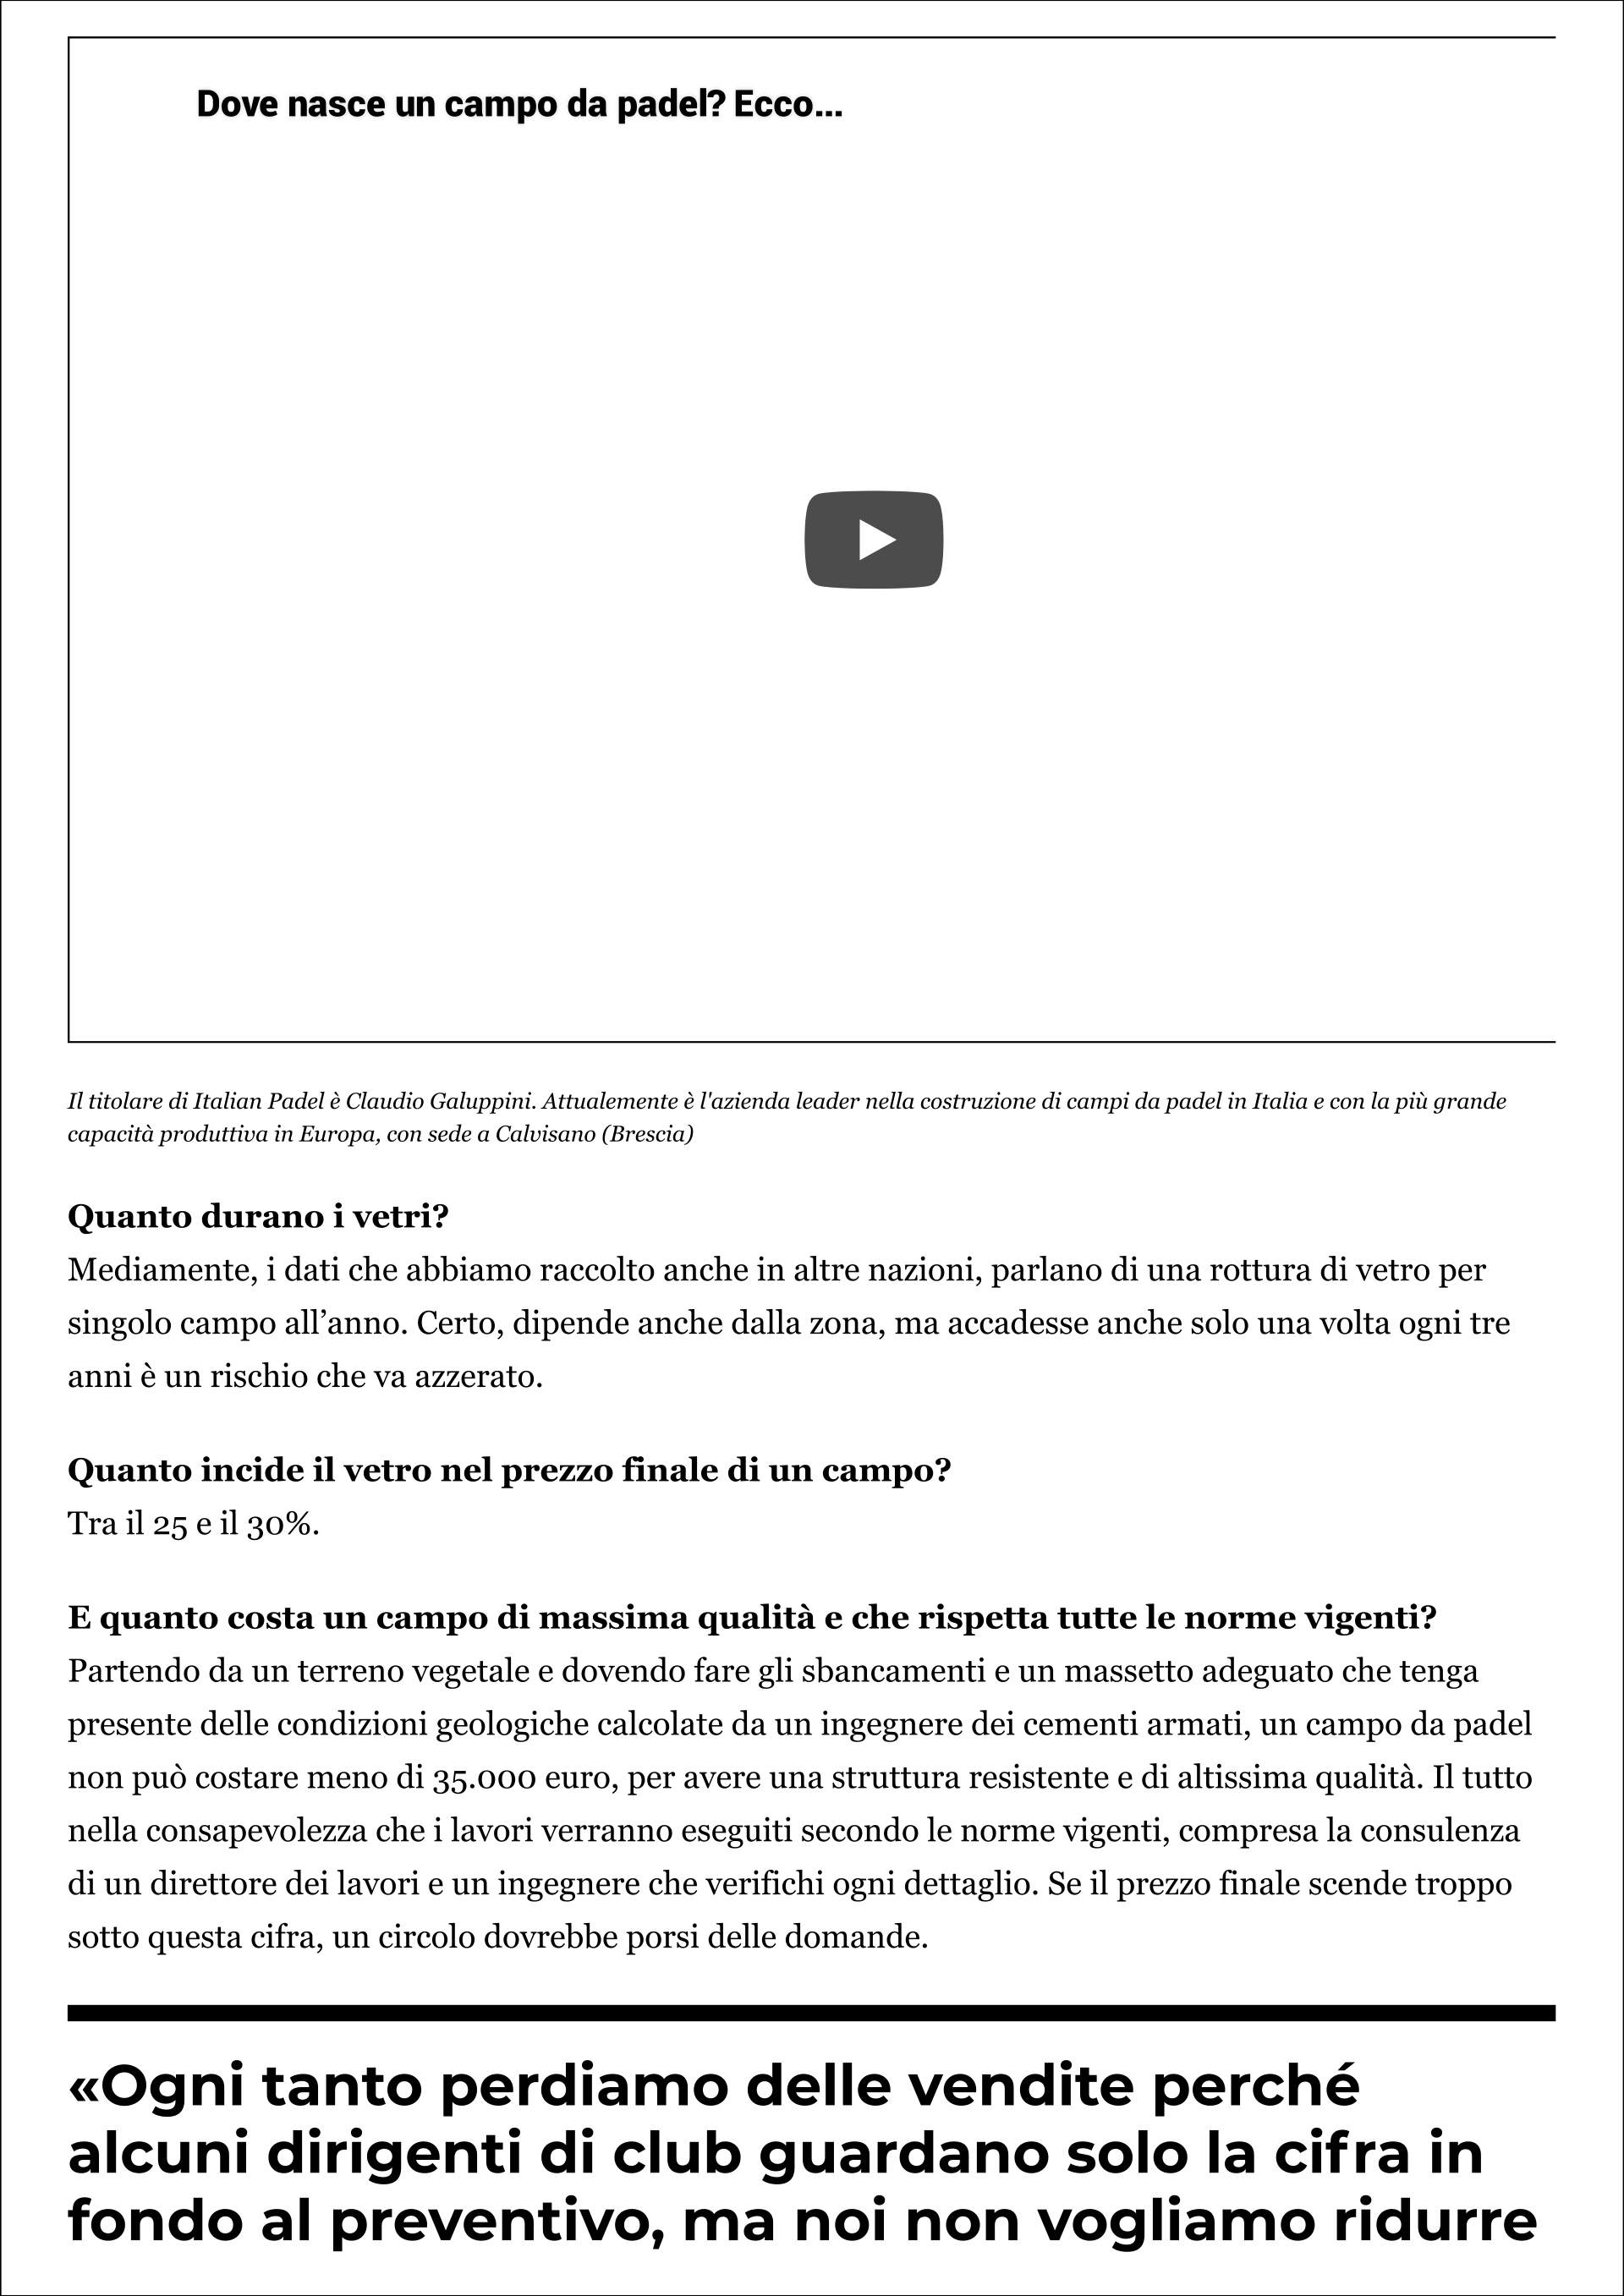 The Leader: Italian Padel (Padel Magazine - 5 novembre 2019) - 3